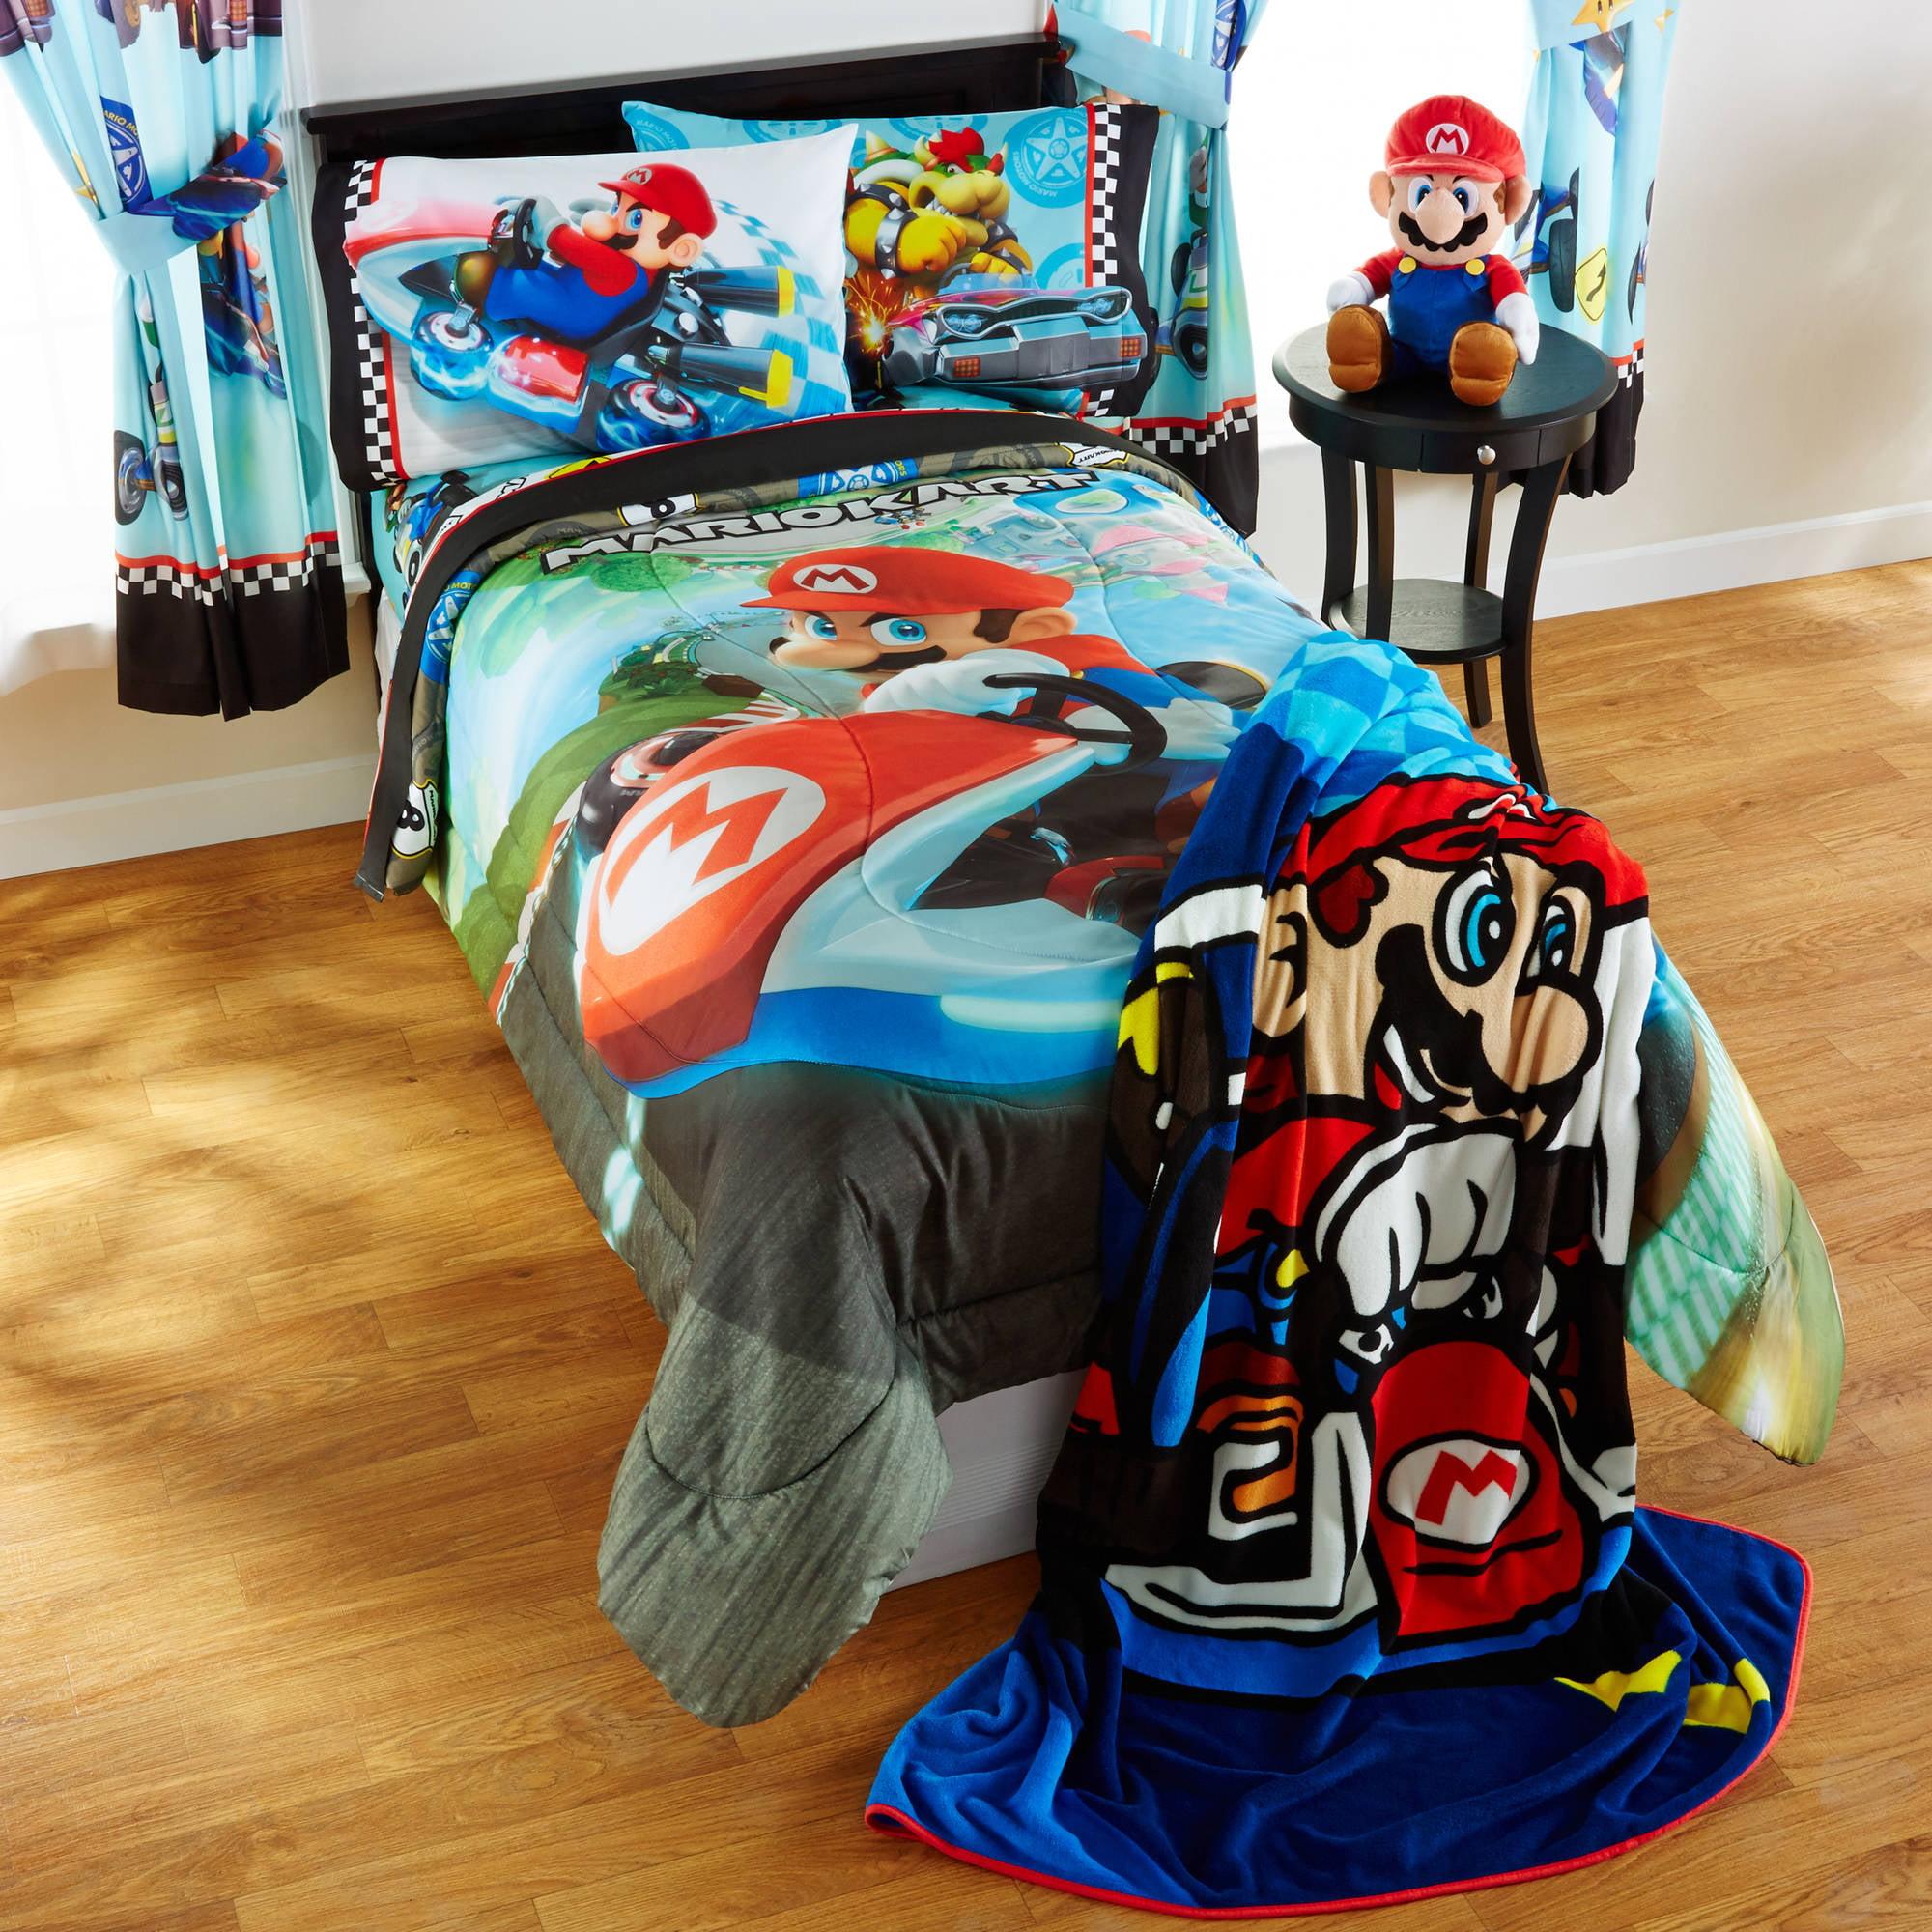 28dc7ccab1 Nintendo Super Mario We Own The Road Twin 62